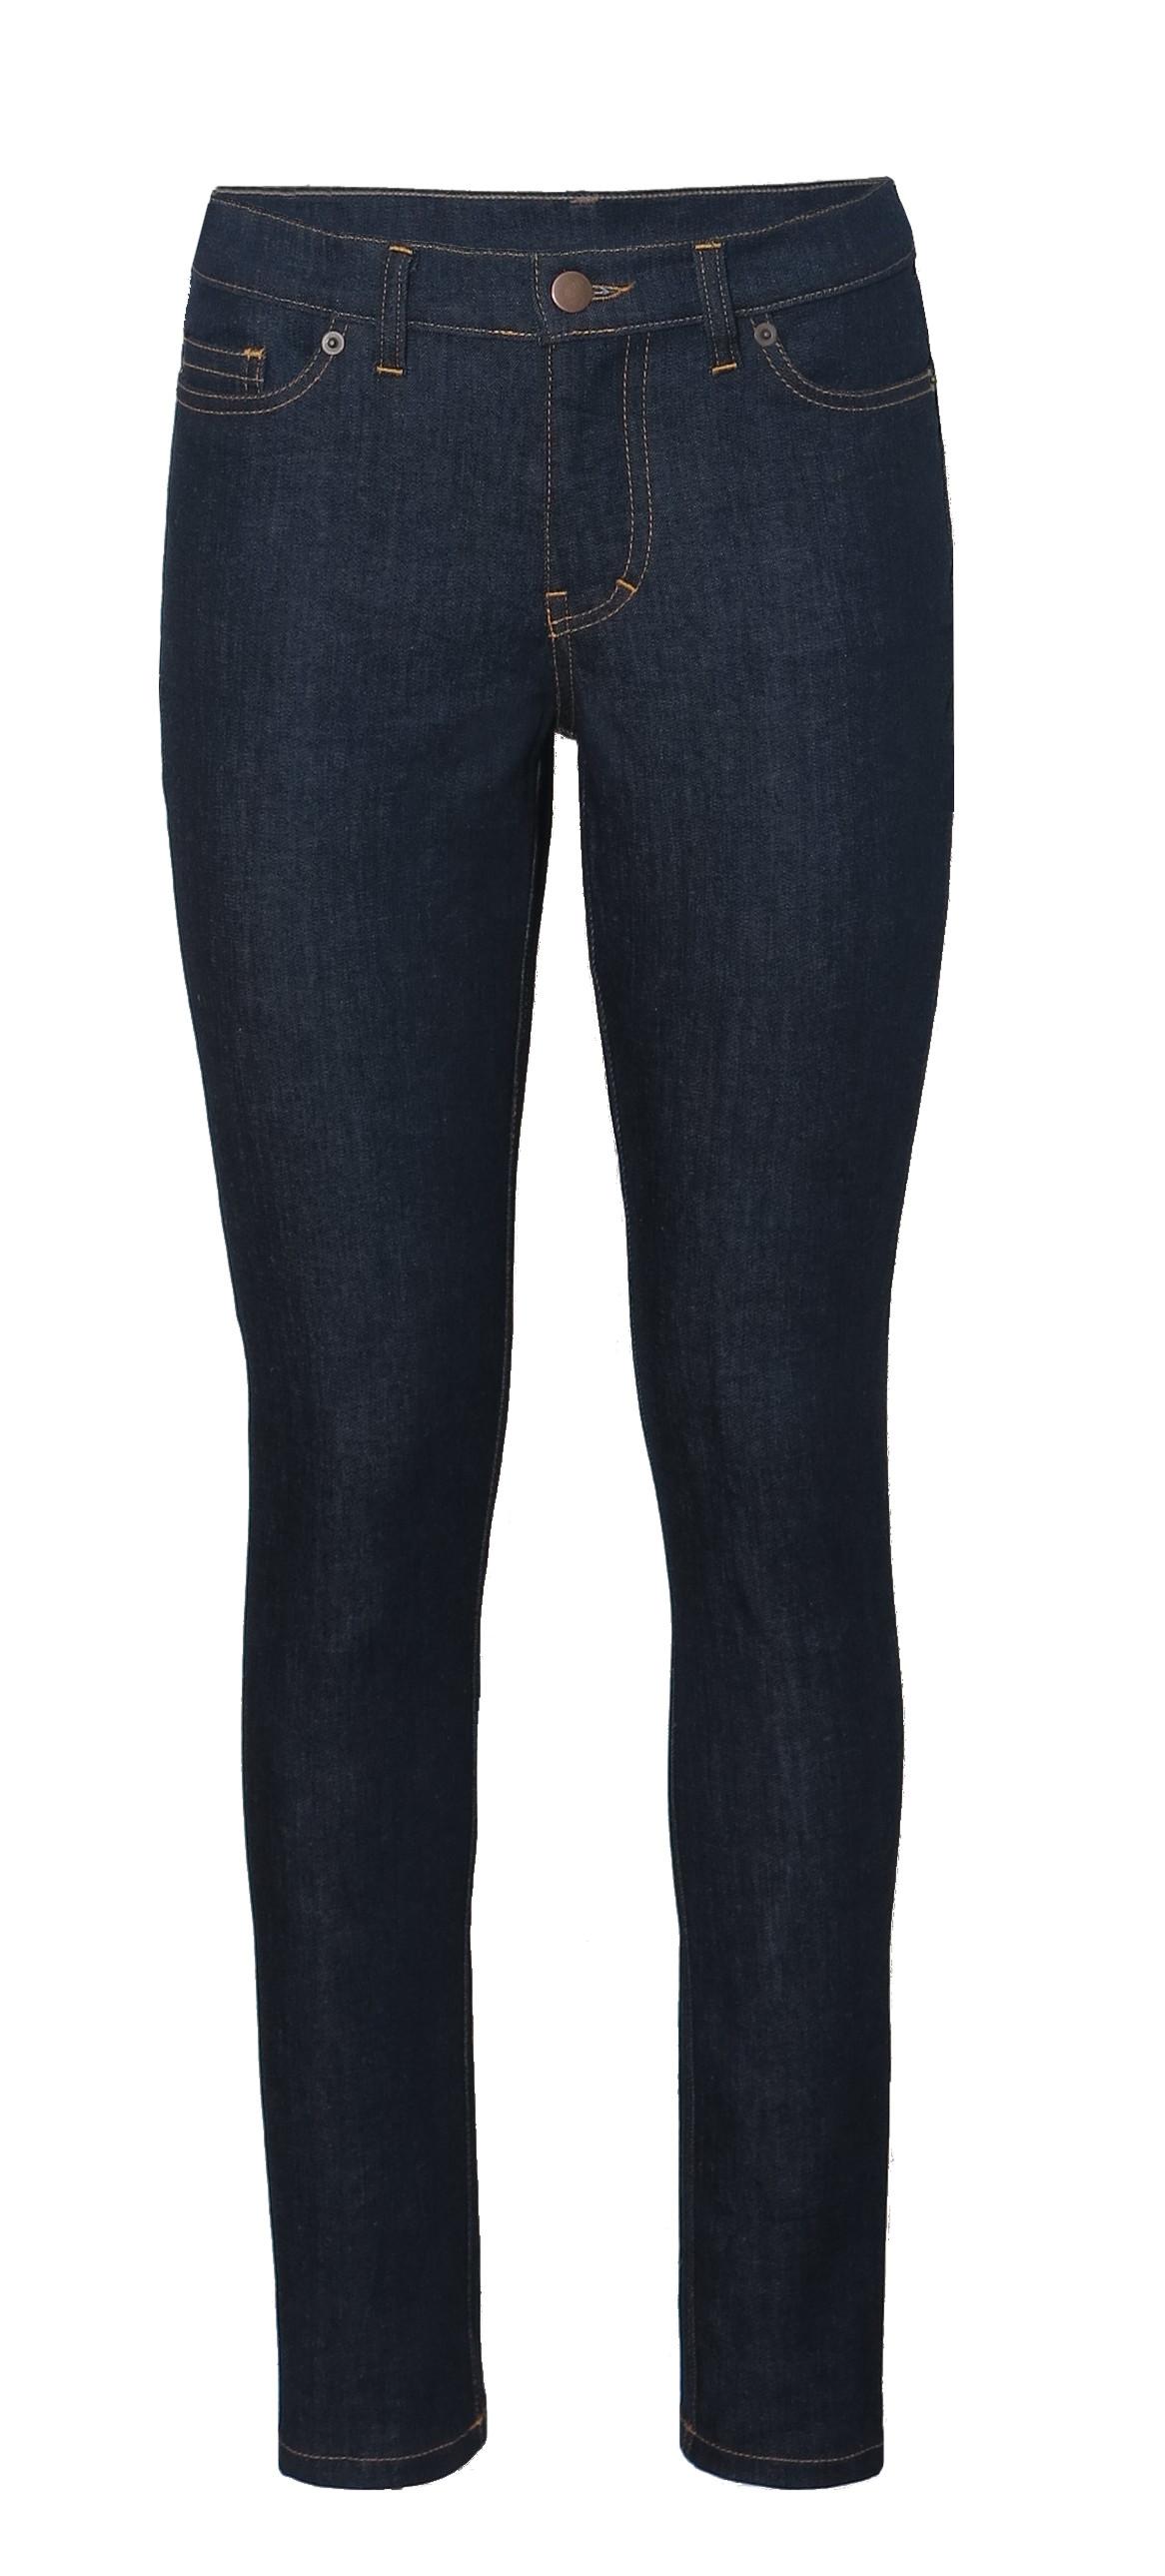 bio jeans f r damen skinny fit r hren jeans biomode naturmode online versand naturmode. Black Bedroom Furniture Sets. Home Design Ideas